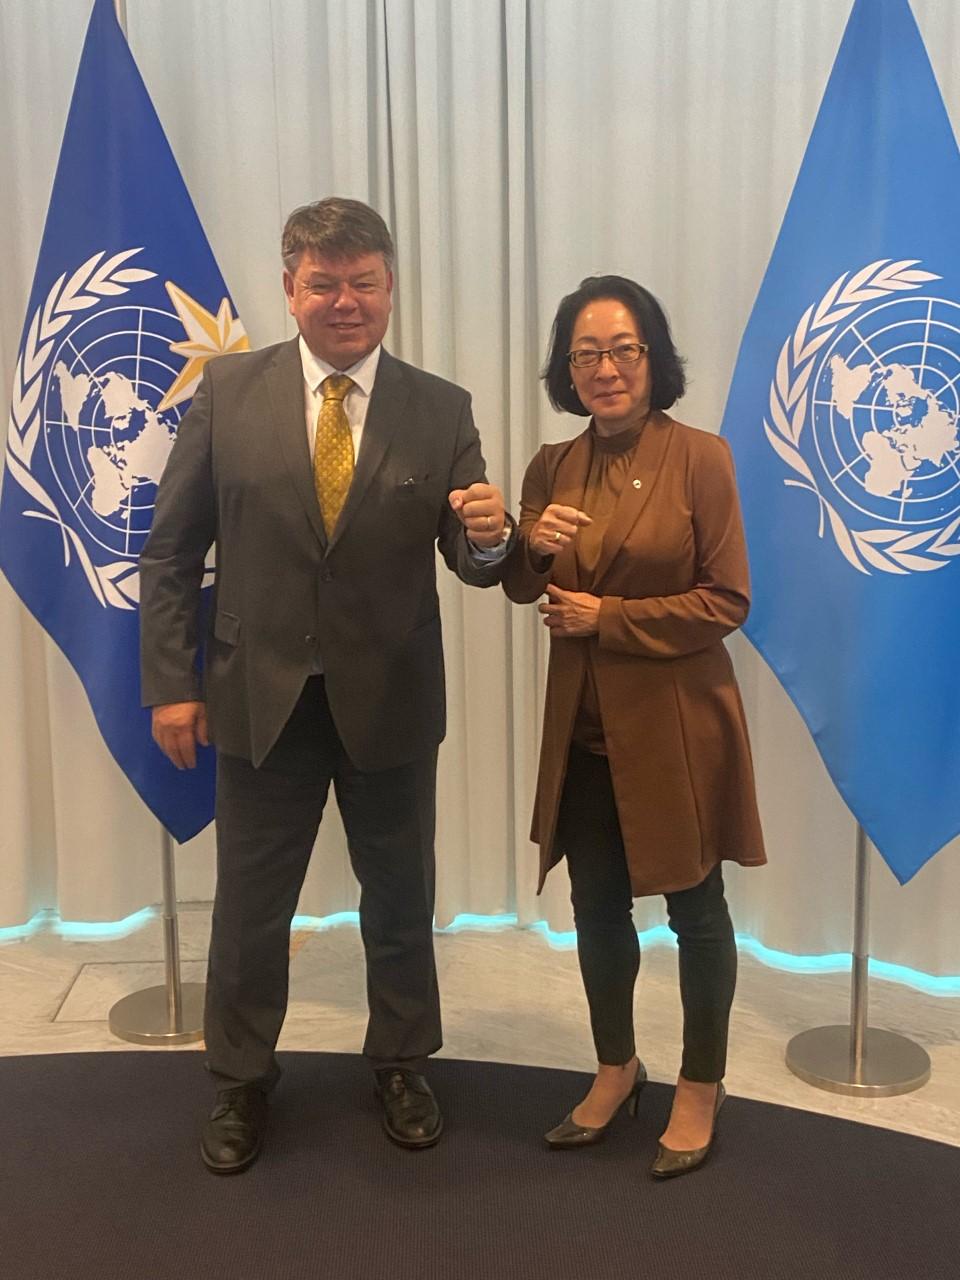 Prof. Petteri Taalas, WMO Secretary-General and Mami Mizutori, the UN Secretary-General's Special Representative for Disaster Risk Reduction